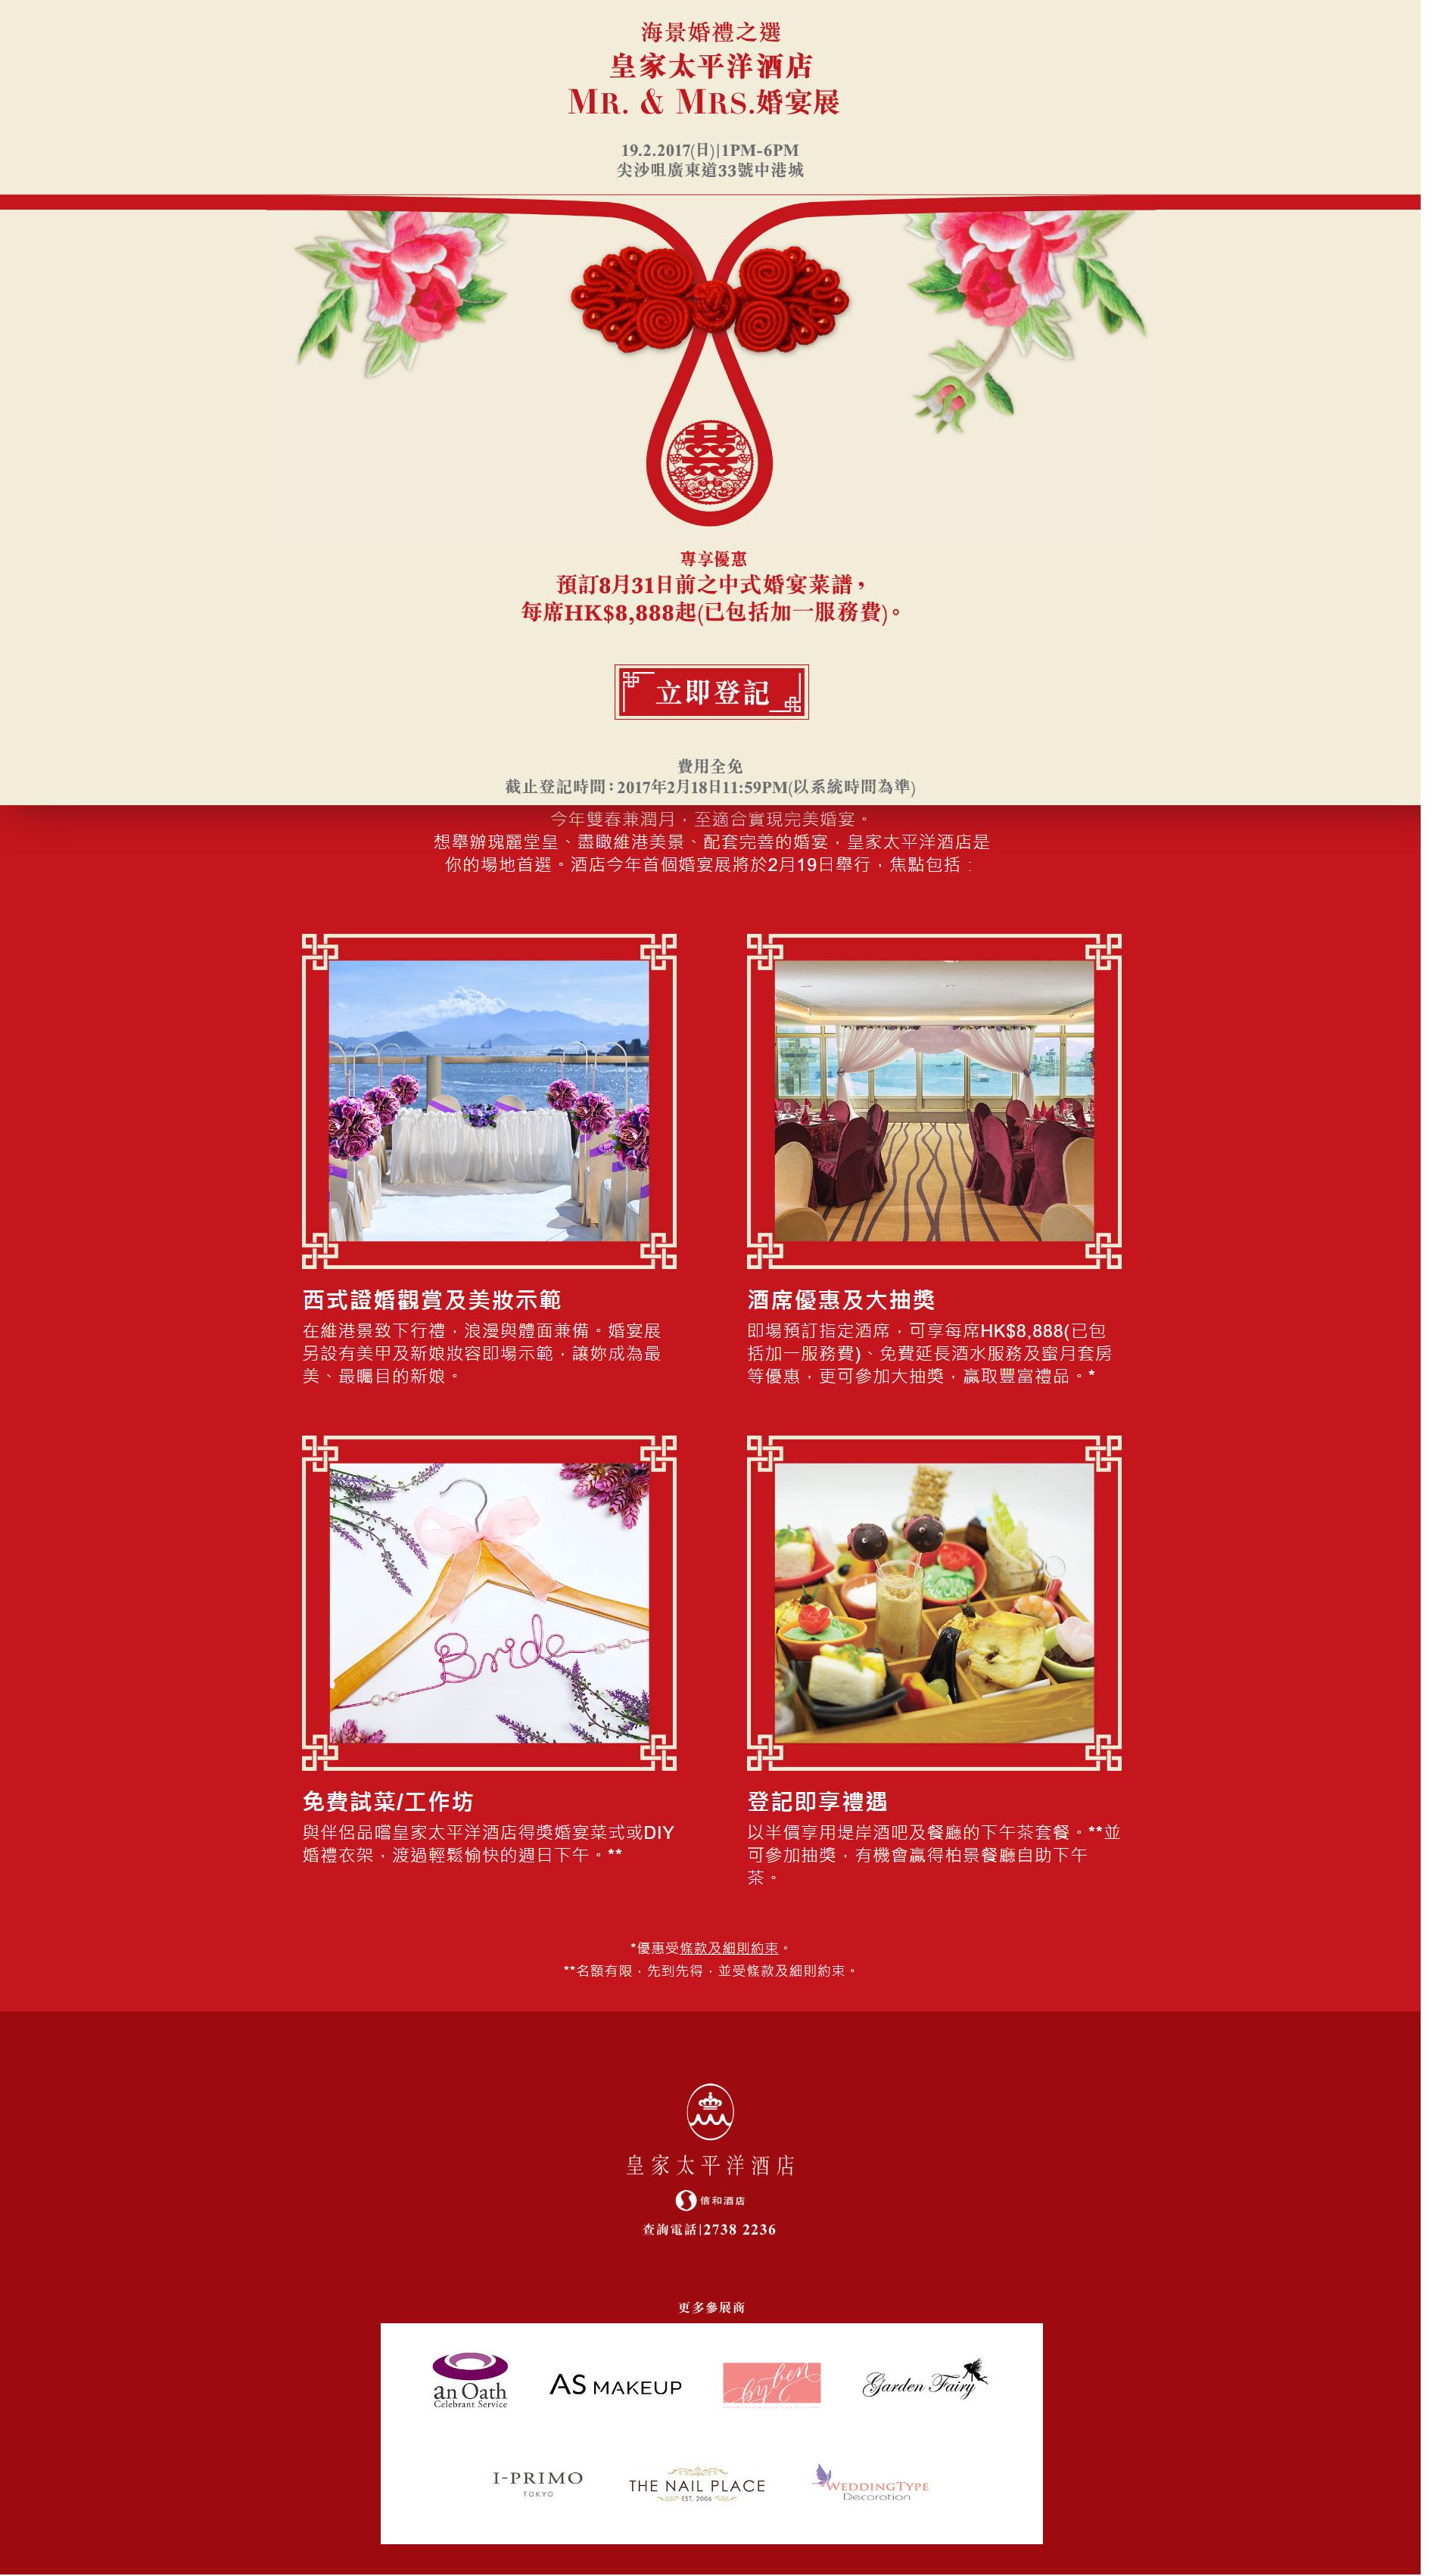 esdlife x 尖沙咀皇家太平洋酒店Mr. & Mrs.婚禮展